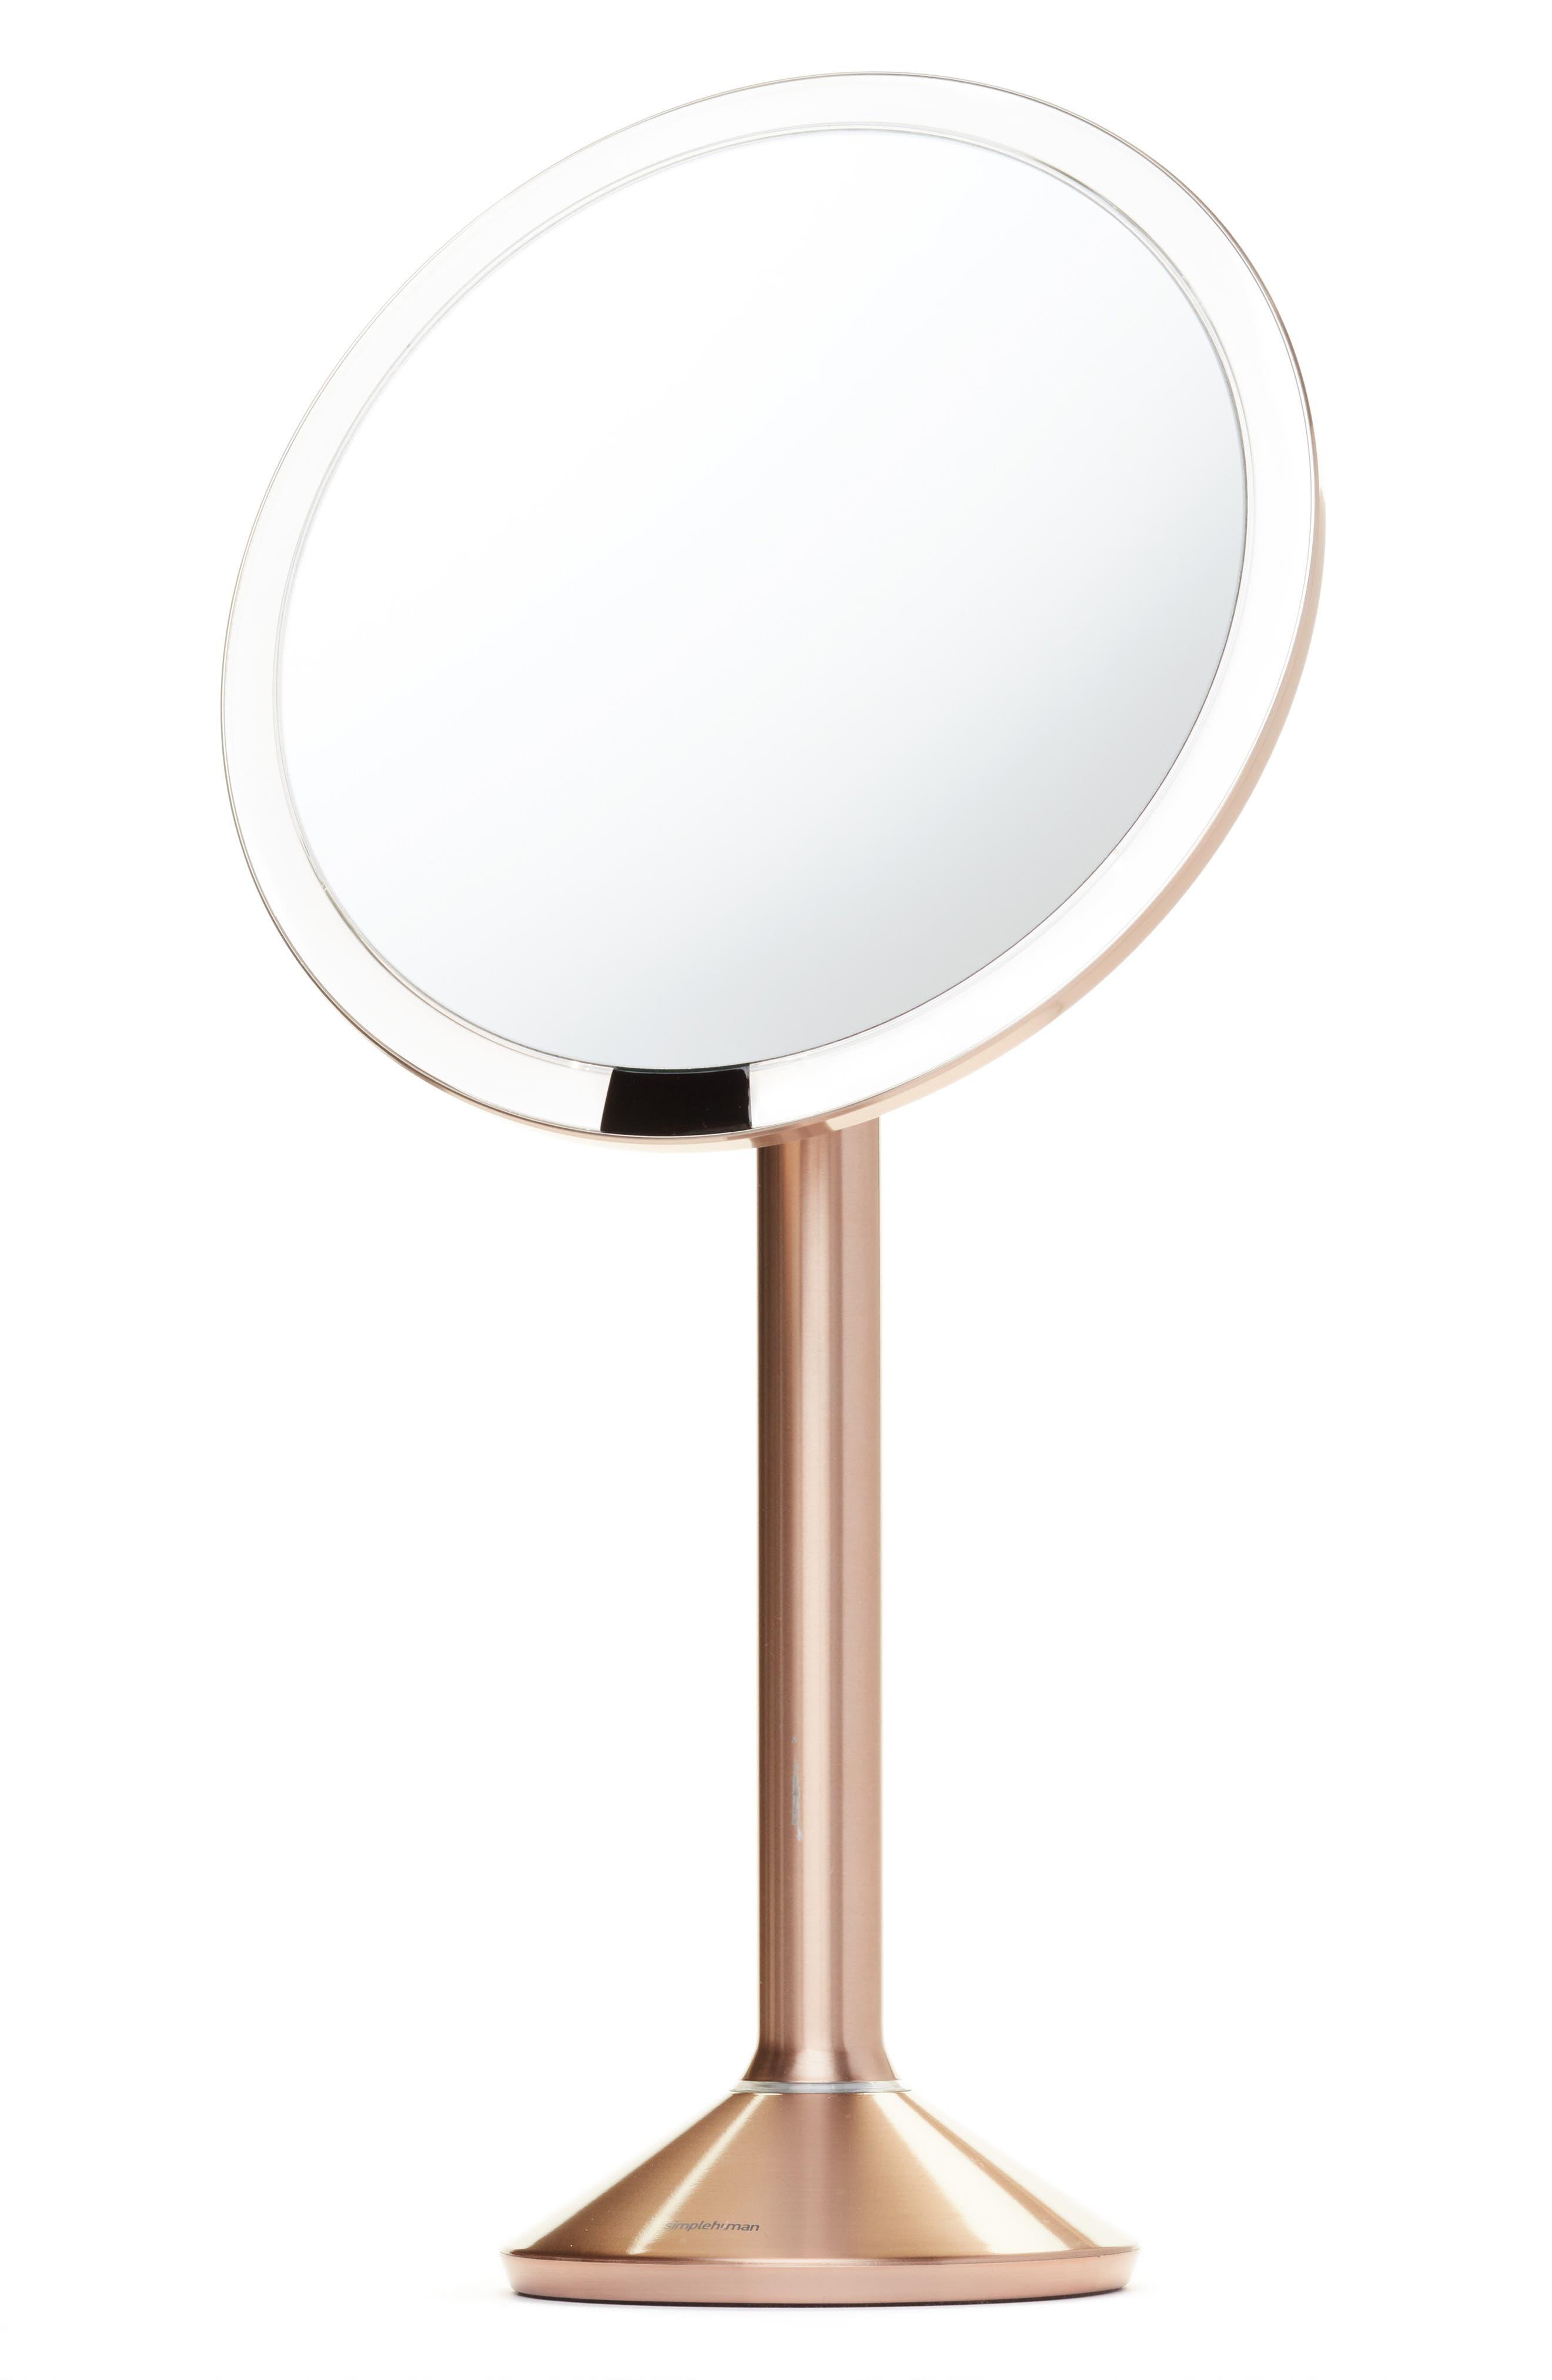 Round Sensor Mirror Pro,                             Main thumbnail 1, color,                             220